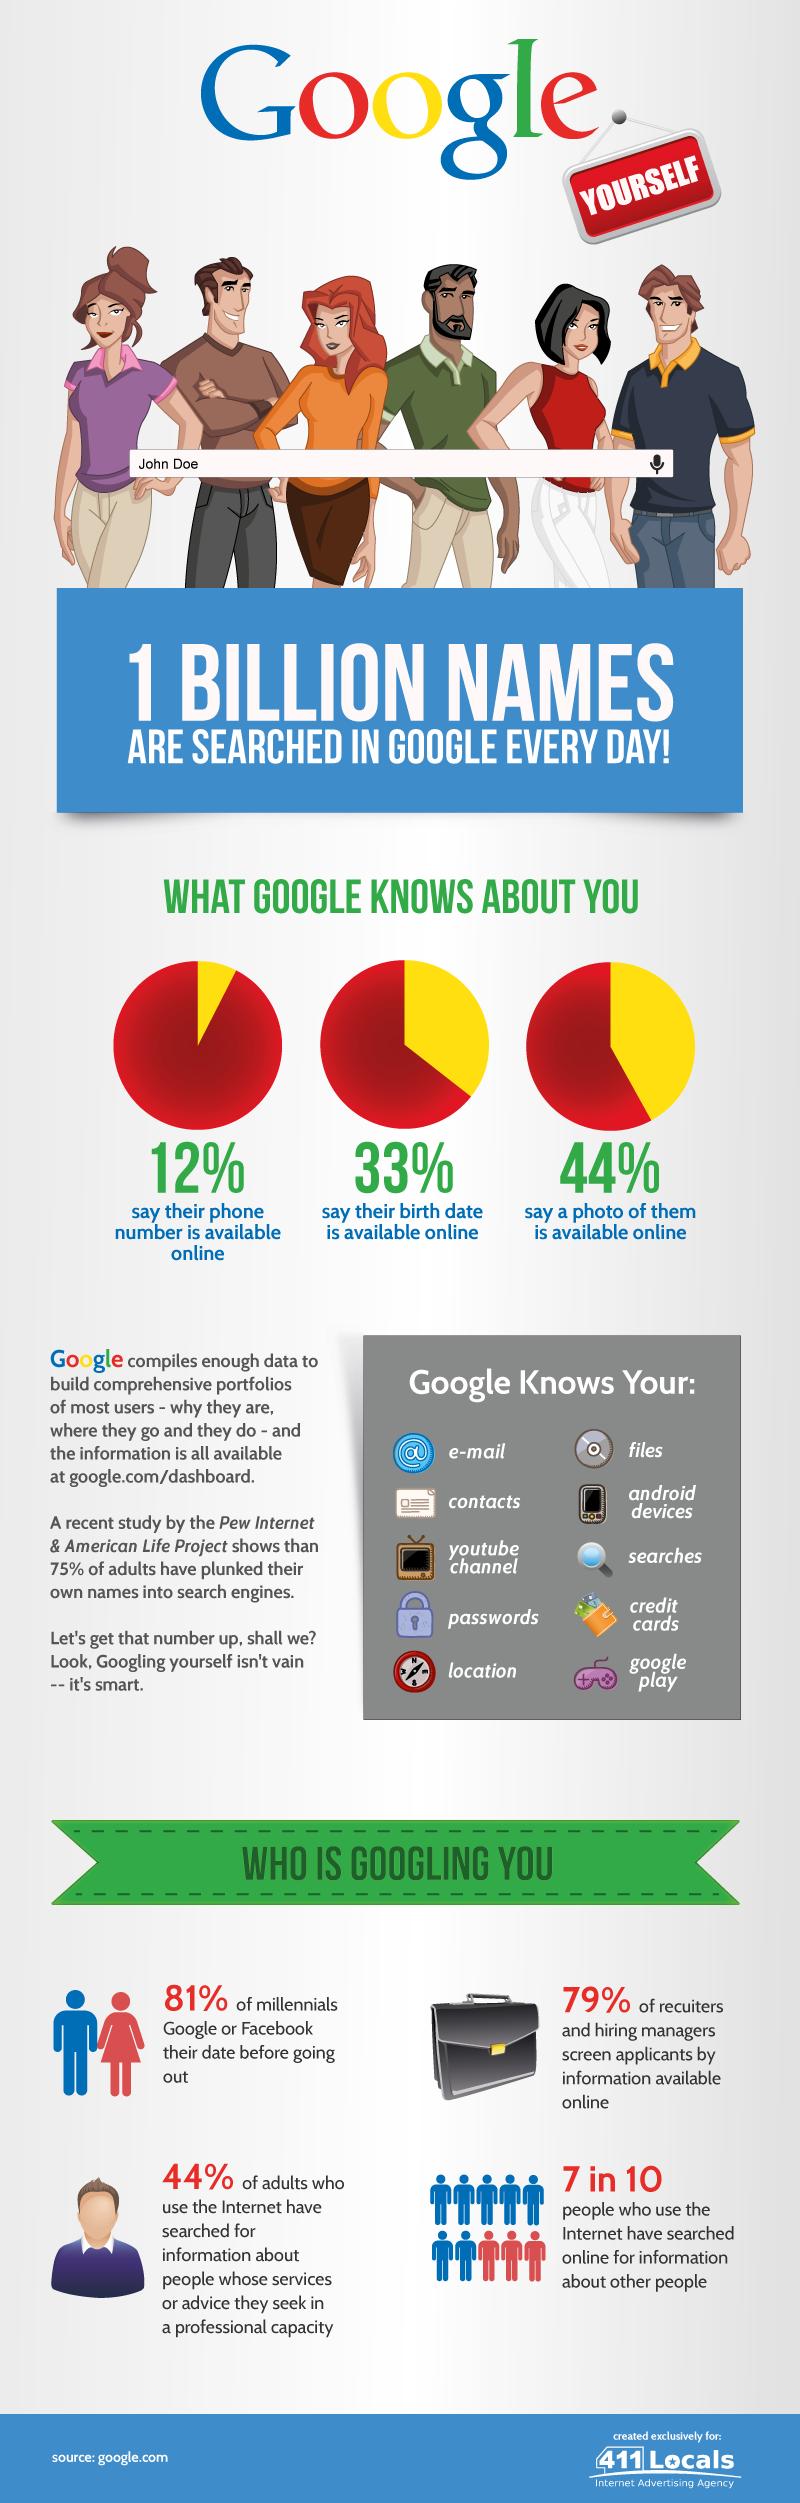 Why should I seek myself on Google? (Infographic)